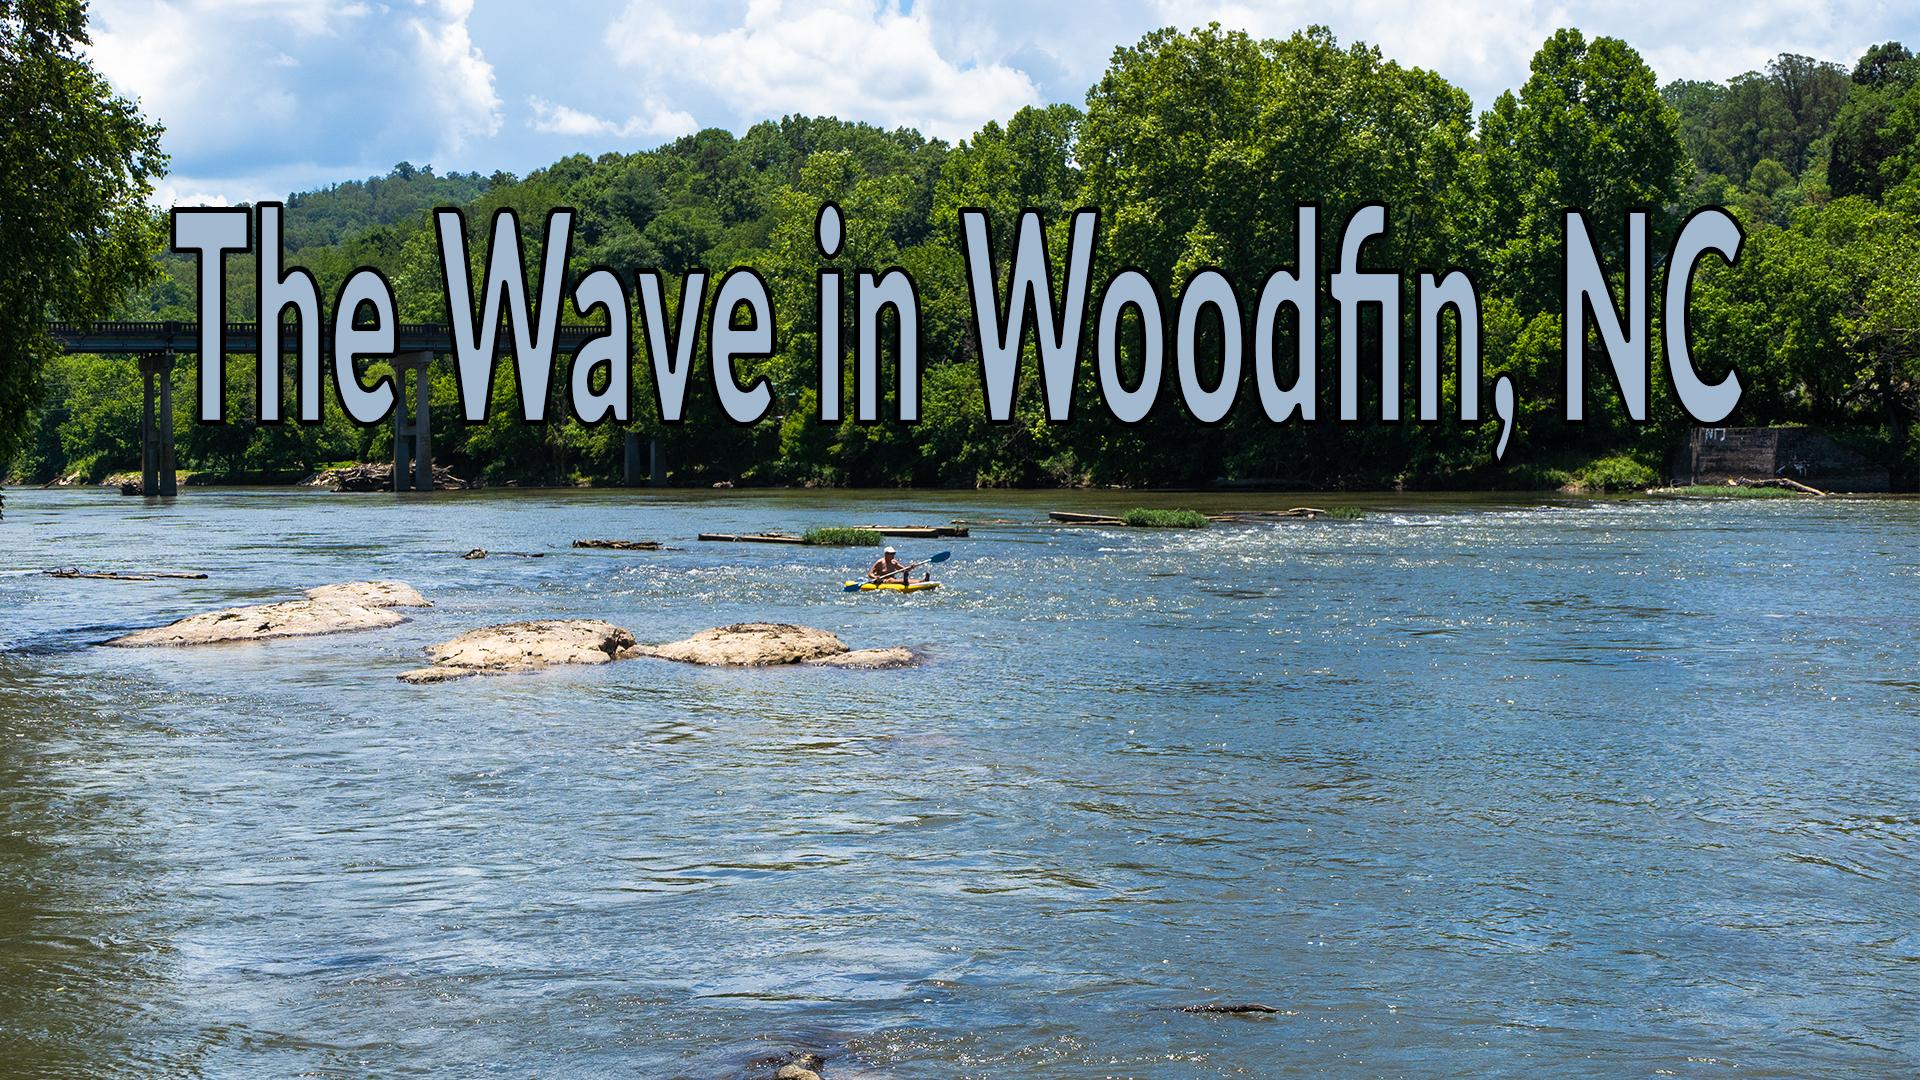 Woodfin, North Carolina's 'Wave' of the Future